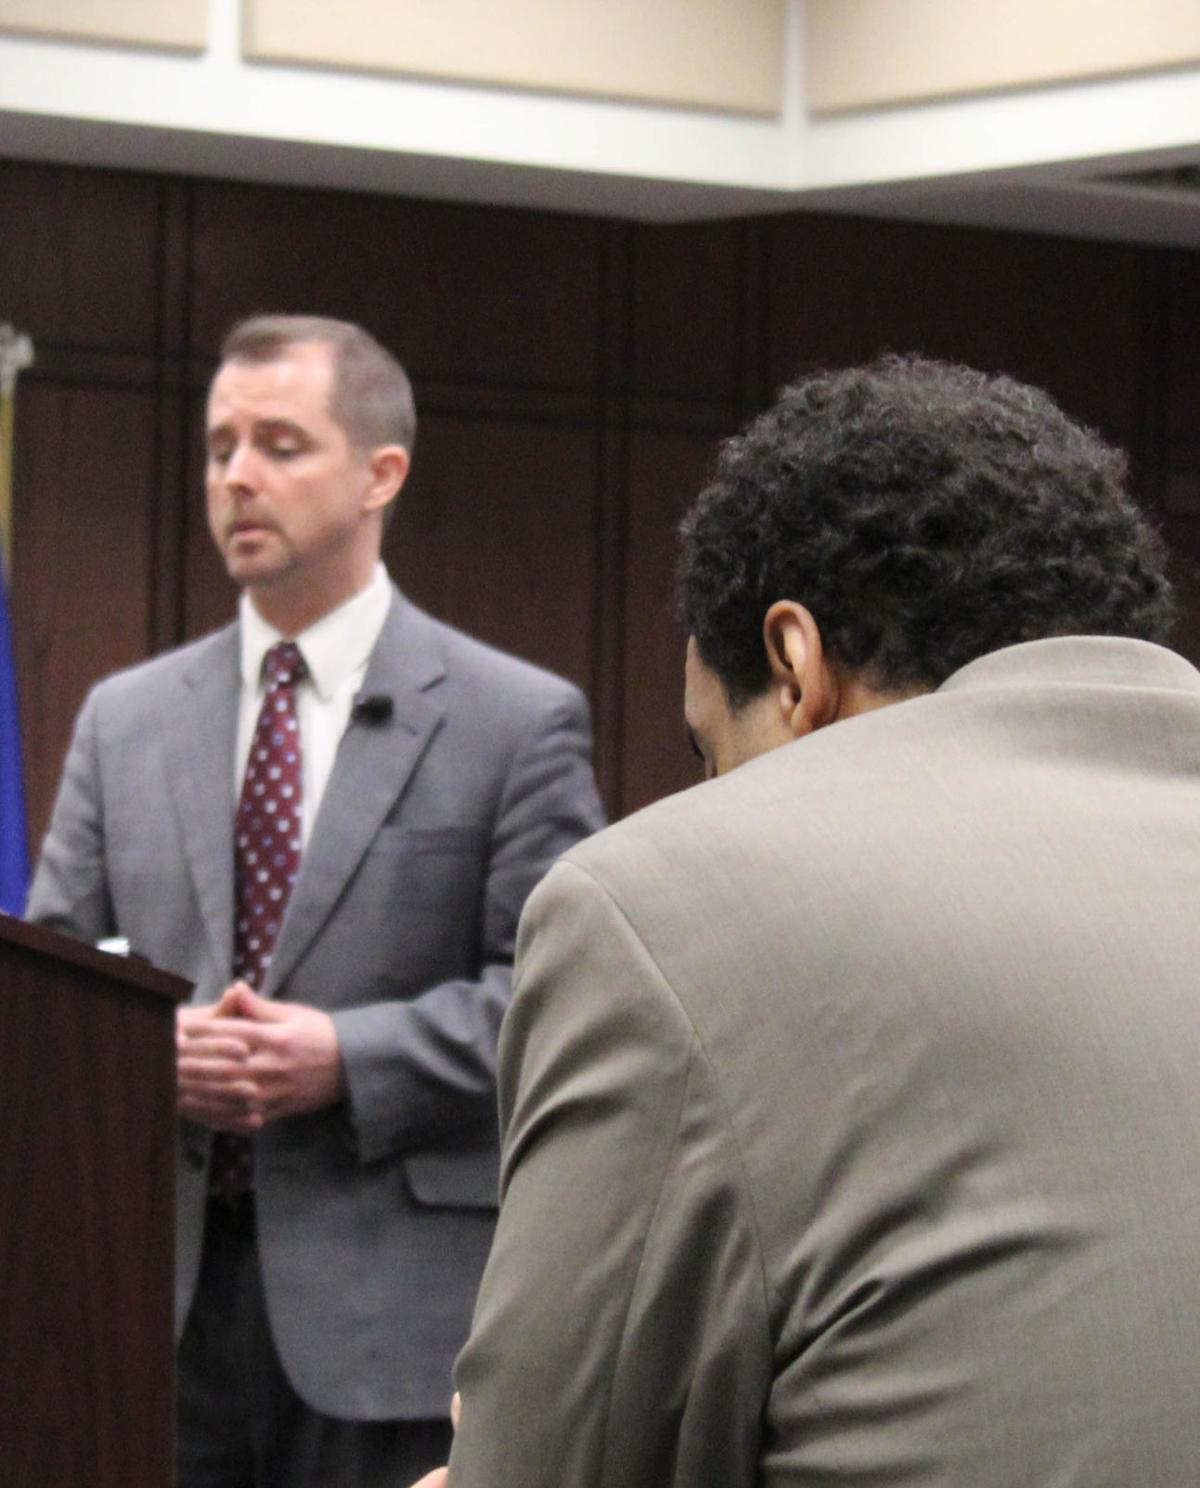 Opening statements heard in Fox Lake homicide case